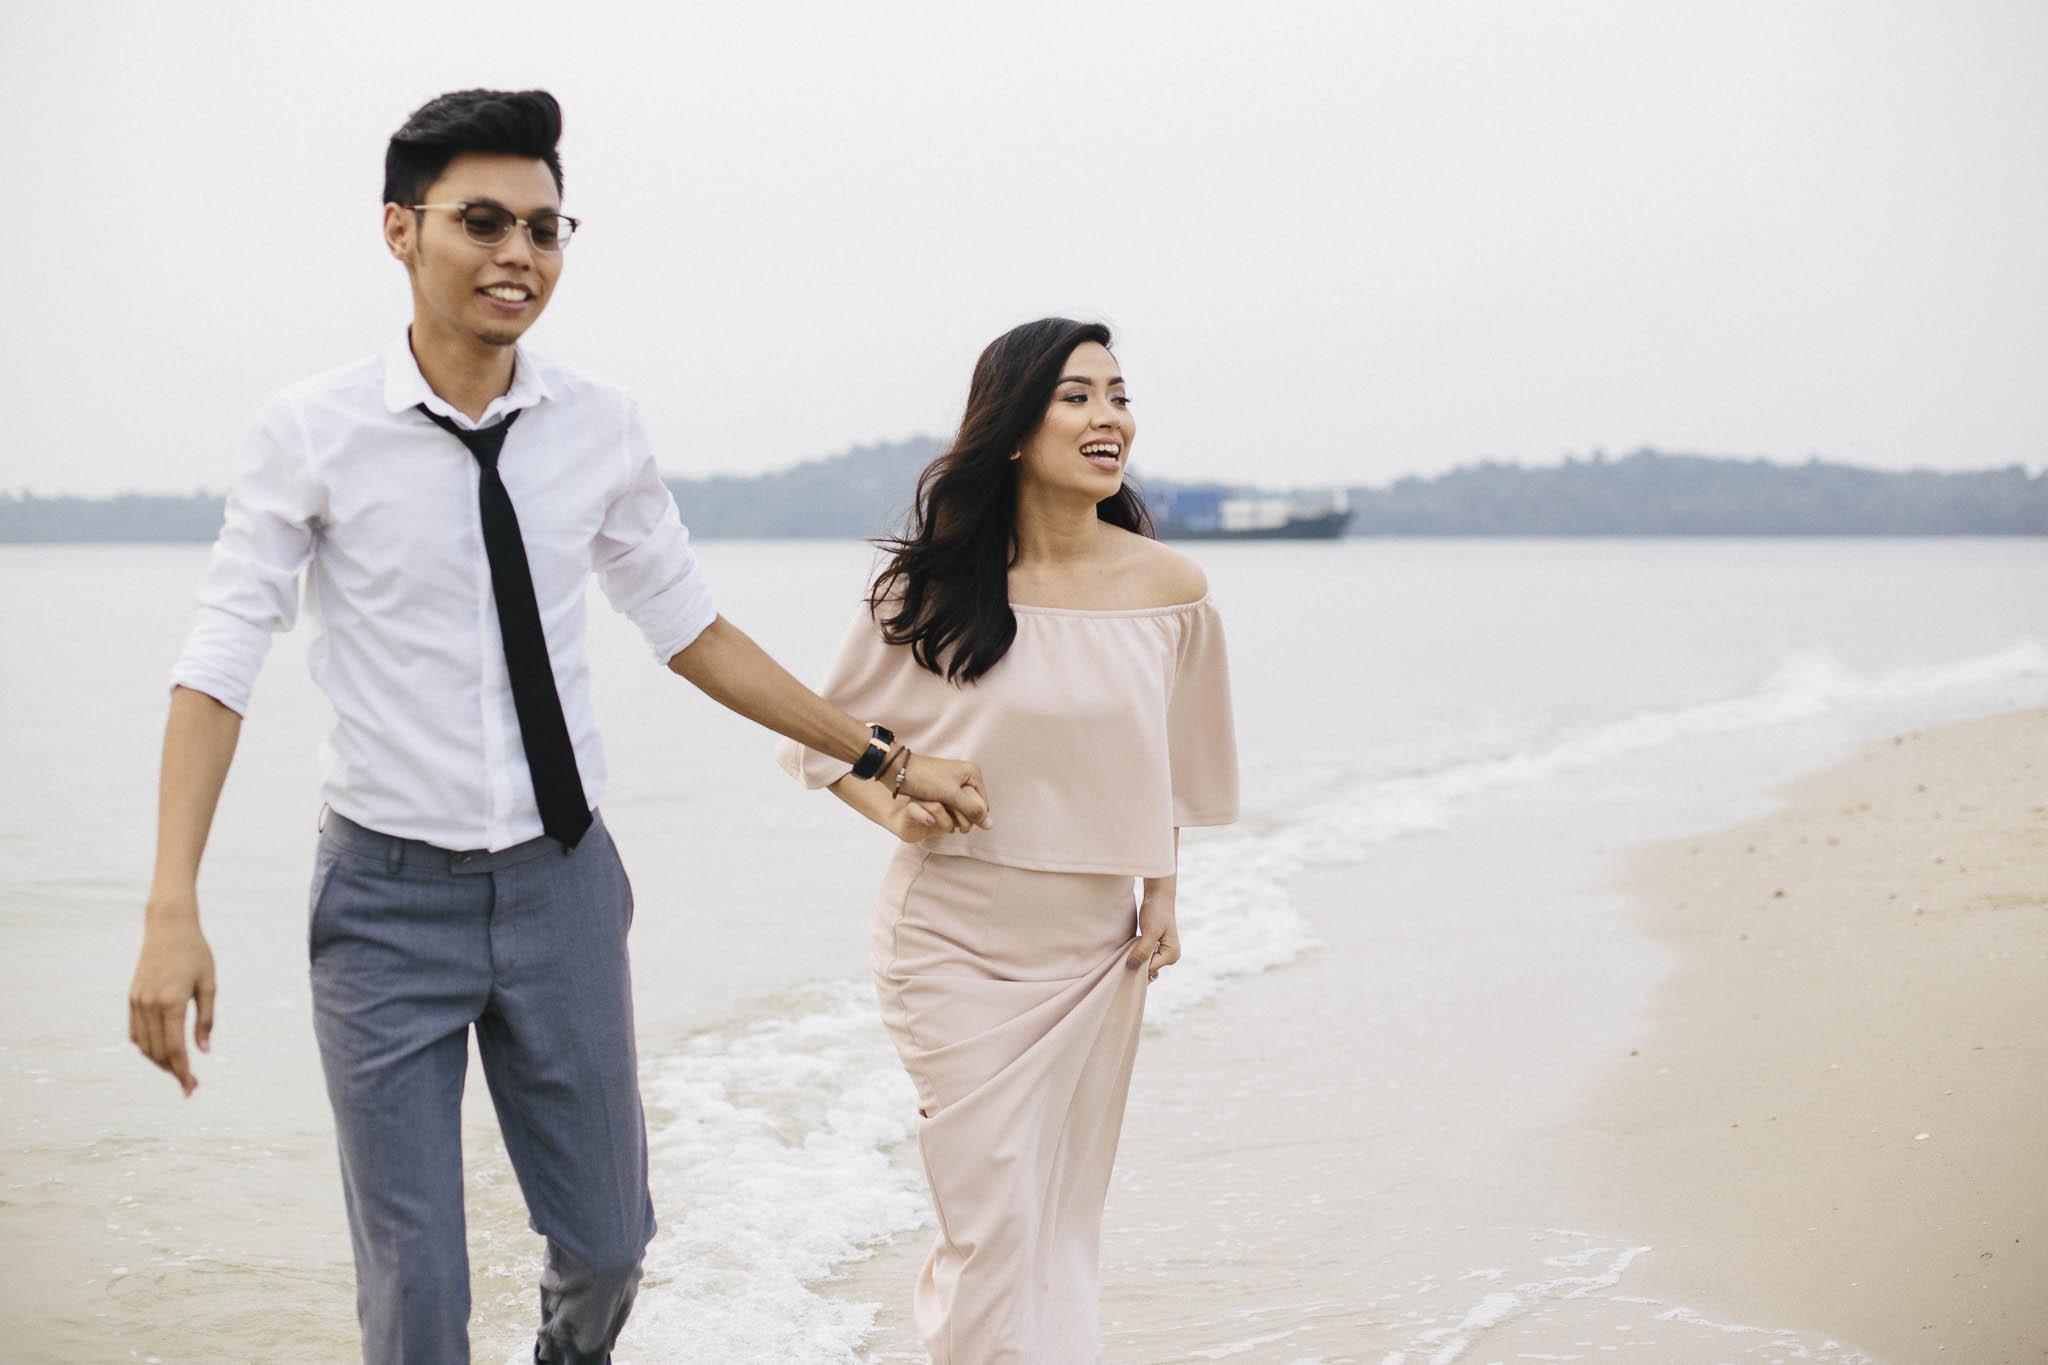 singapore-wedding-photographer-malay-travel-adli-tashah-34.jpg